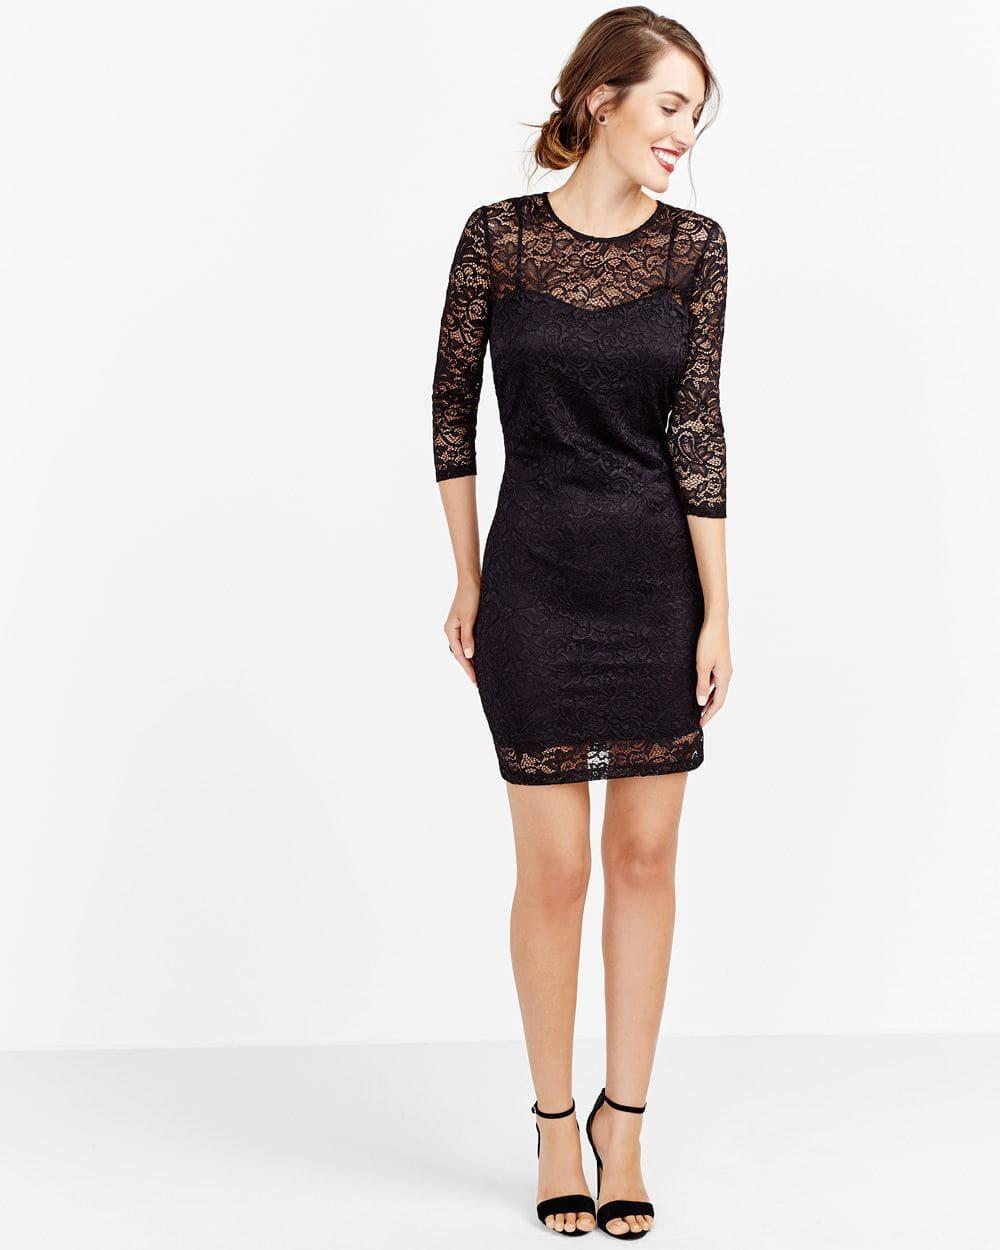 Lace Bodycon Dress